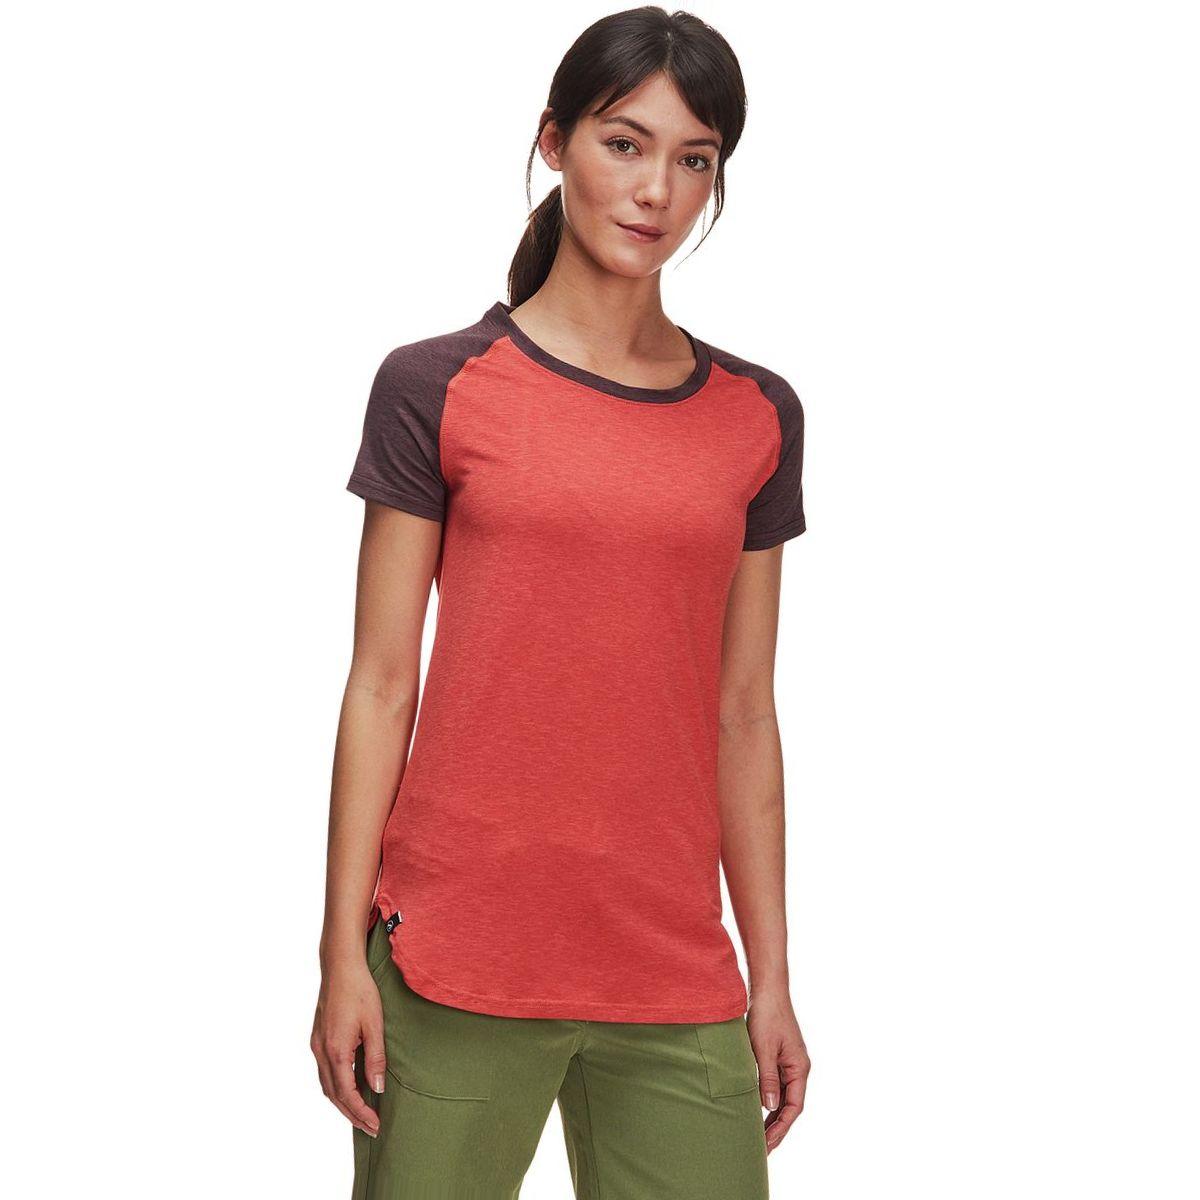 Flylow Jessi Shirt - Women's